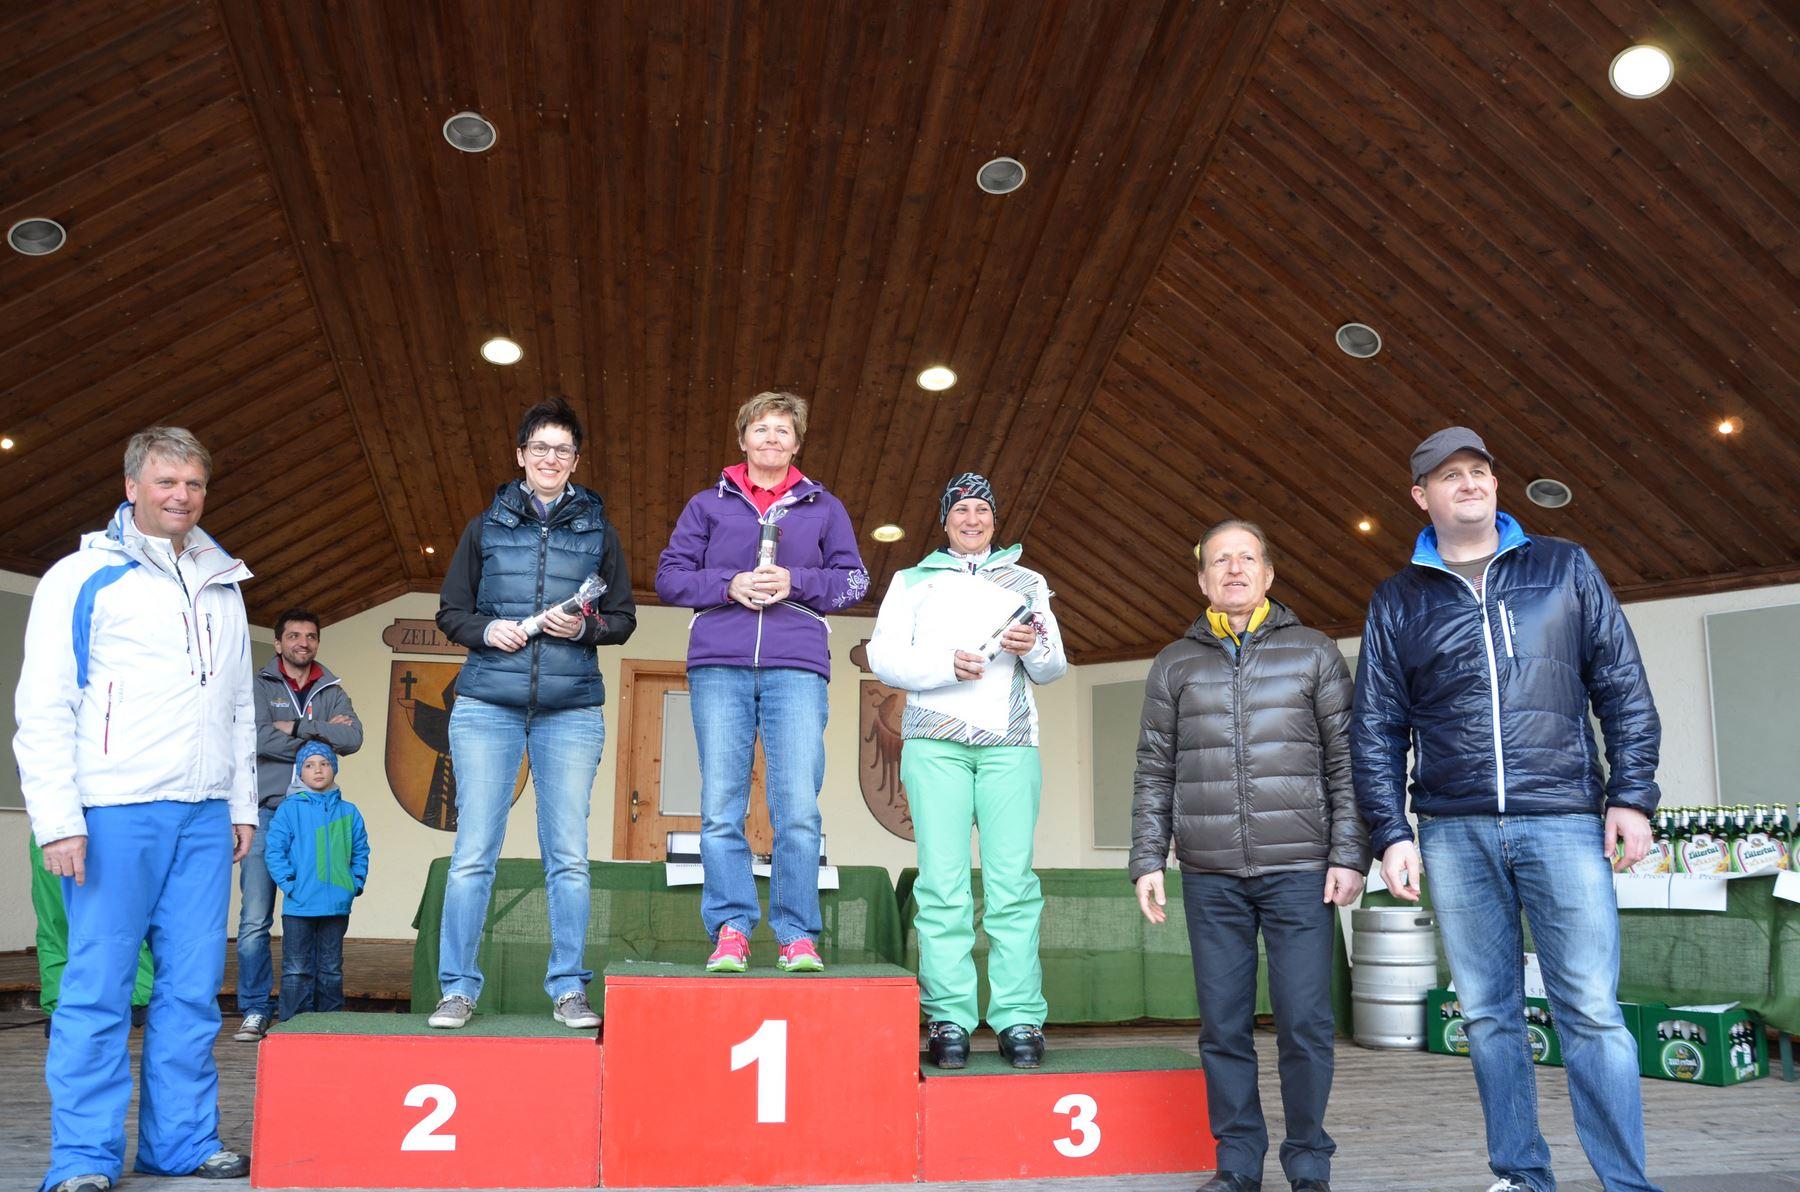 2015-03-22 BV Zillertal Skirennen 462.JPG